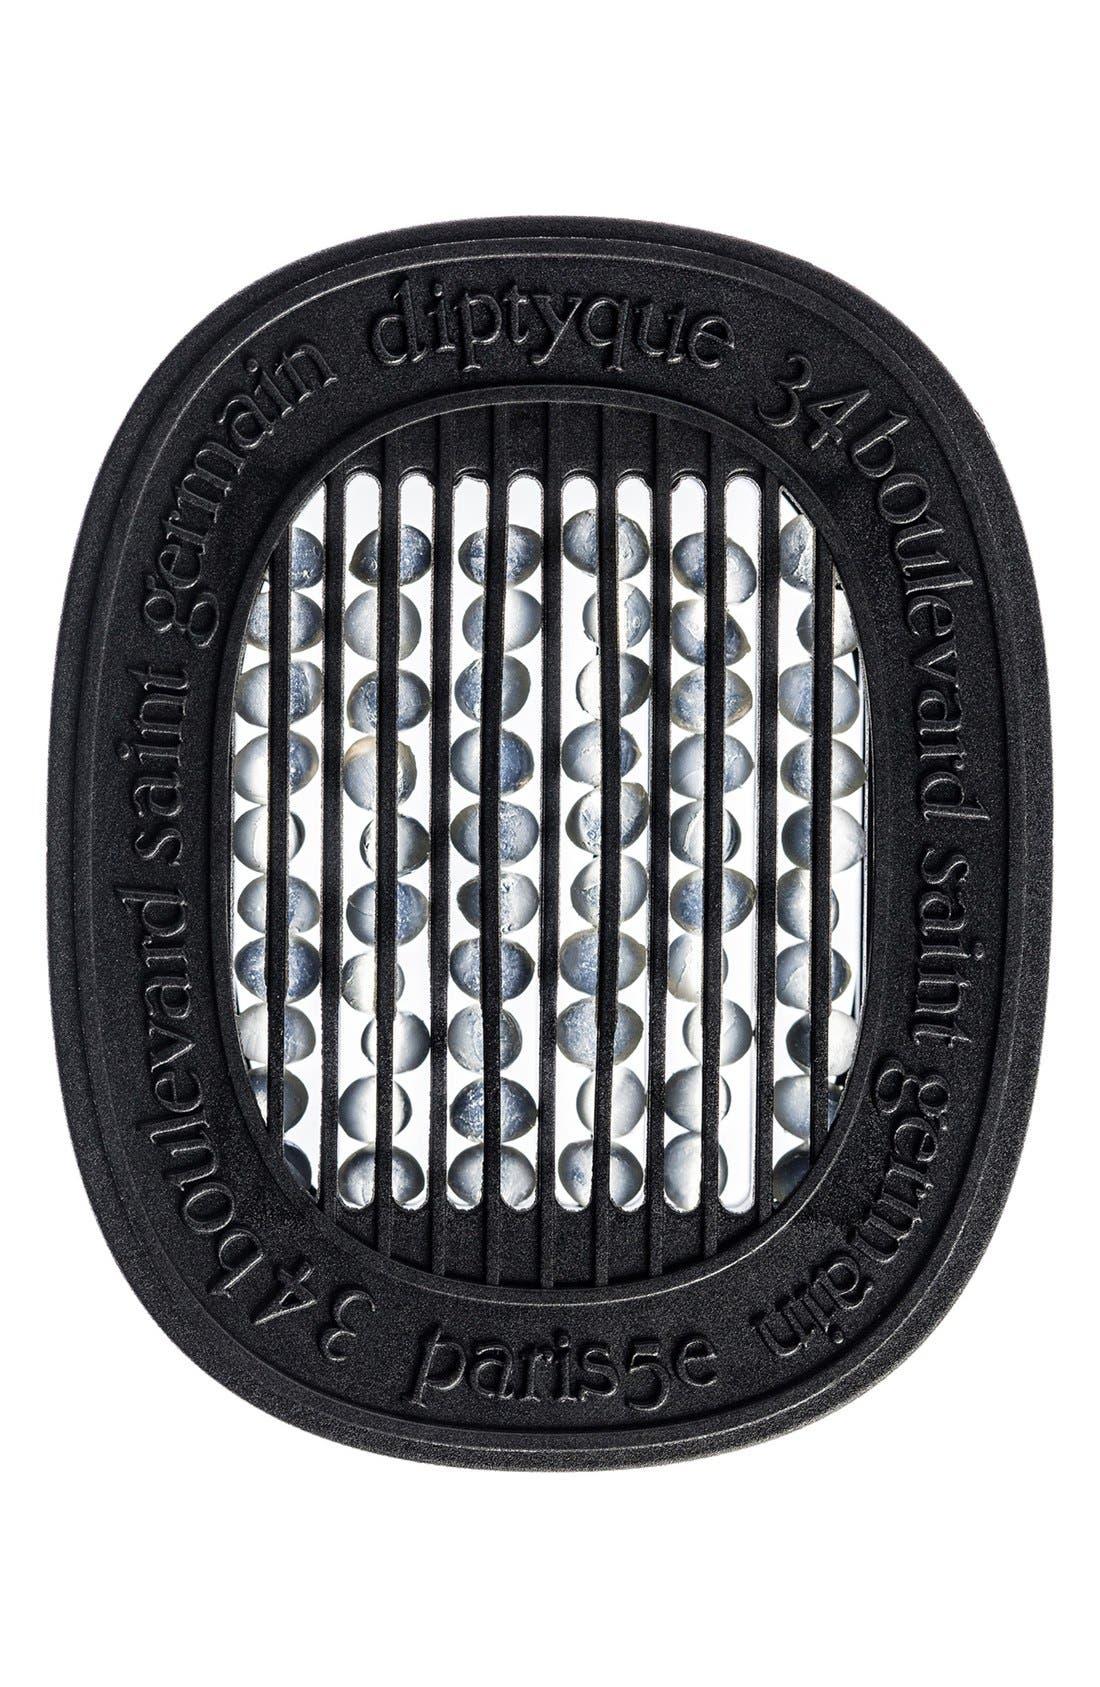 Alternate Image 1 Selected - diptyque 'Roses' Electric Diffuser Refill Capsule